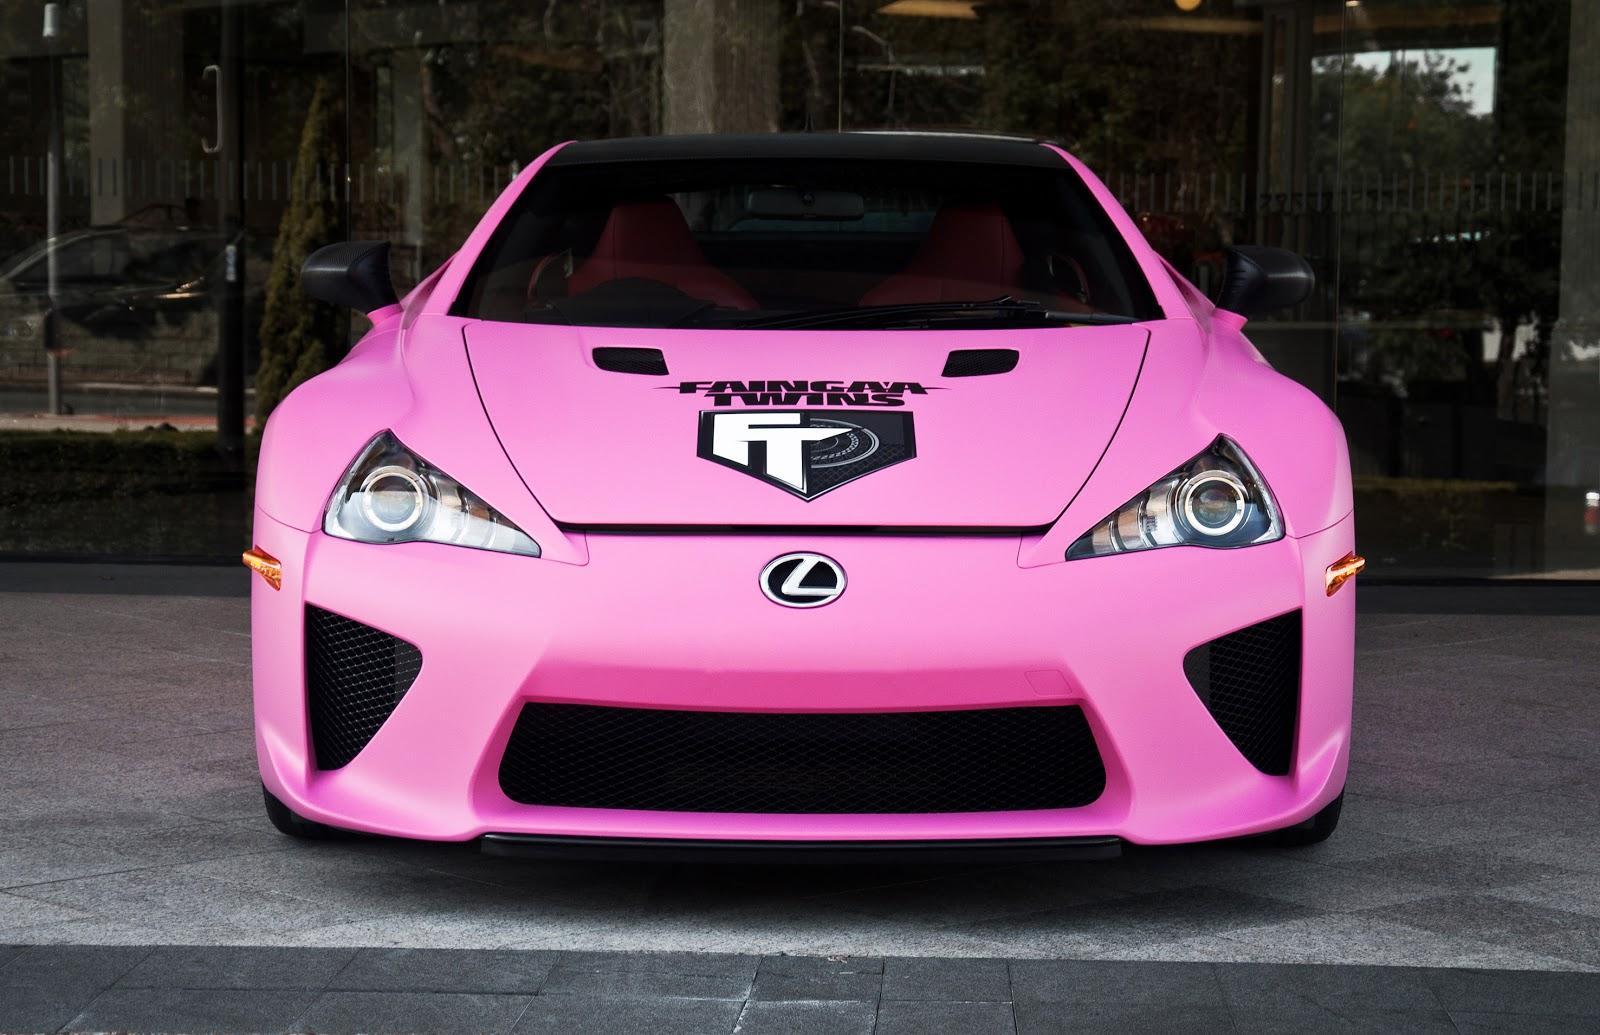 2012 Lexus Lfa Pink 171 Cars